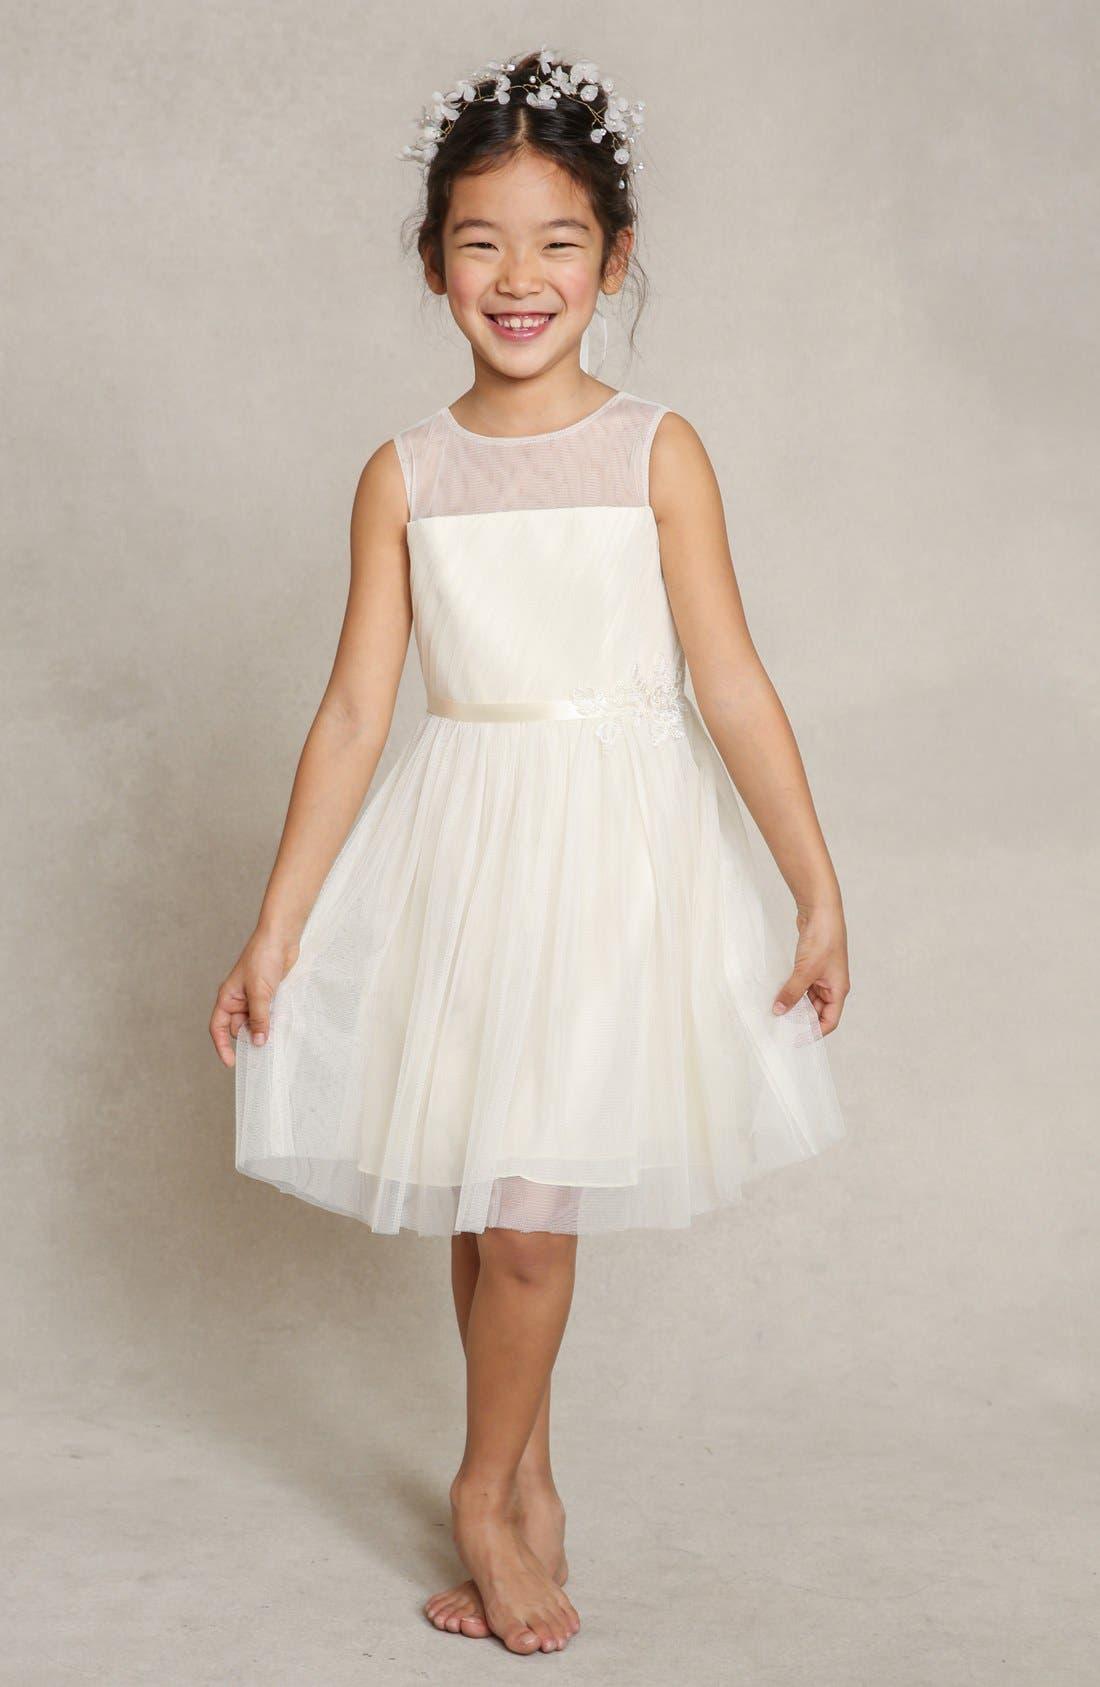 Main Image - Jenny Yoo 'Zoe' Floral Appliqué Tulle Dress (Toddler, Little Girls & Big Girls)